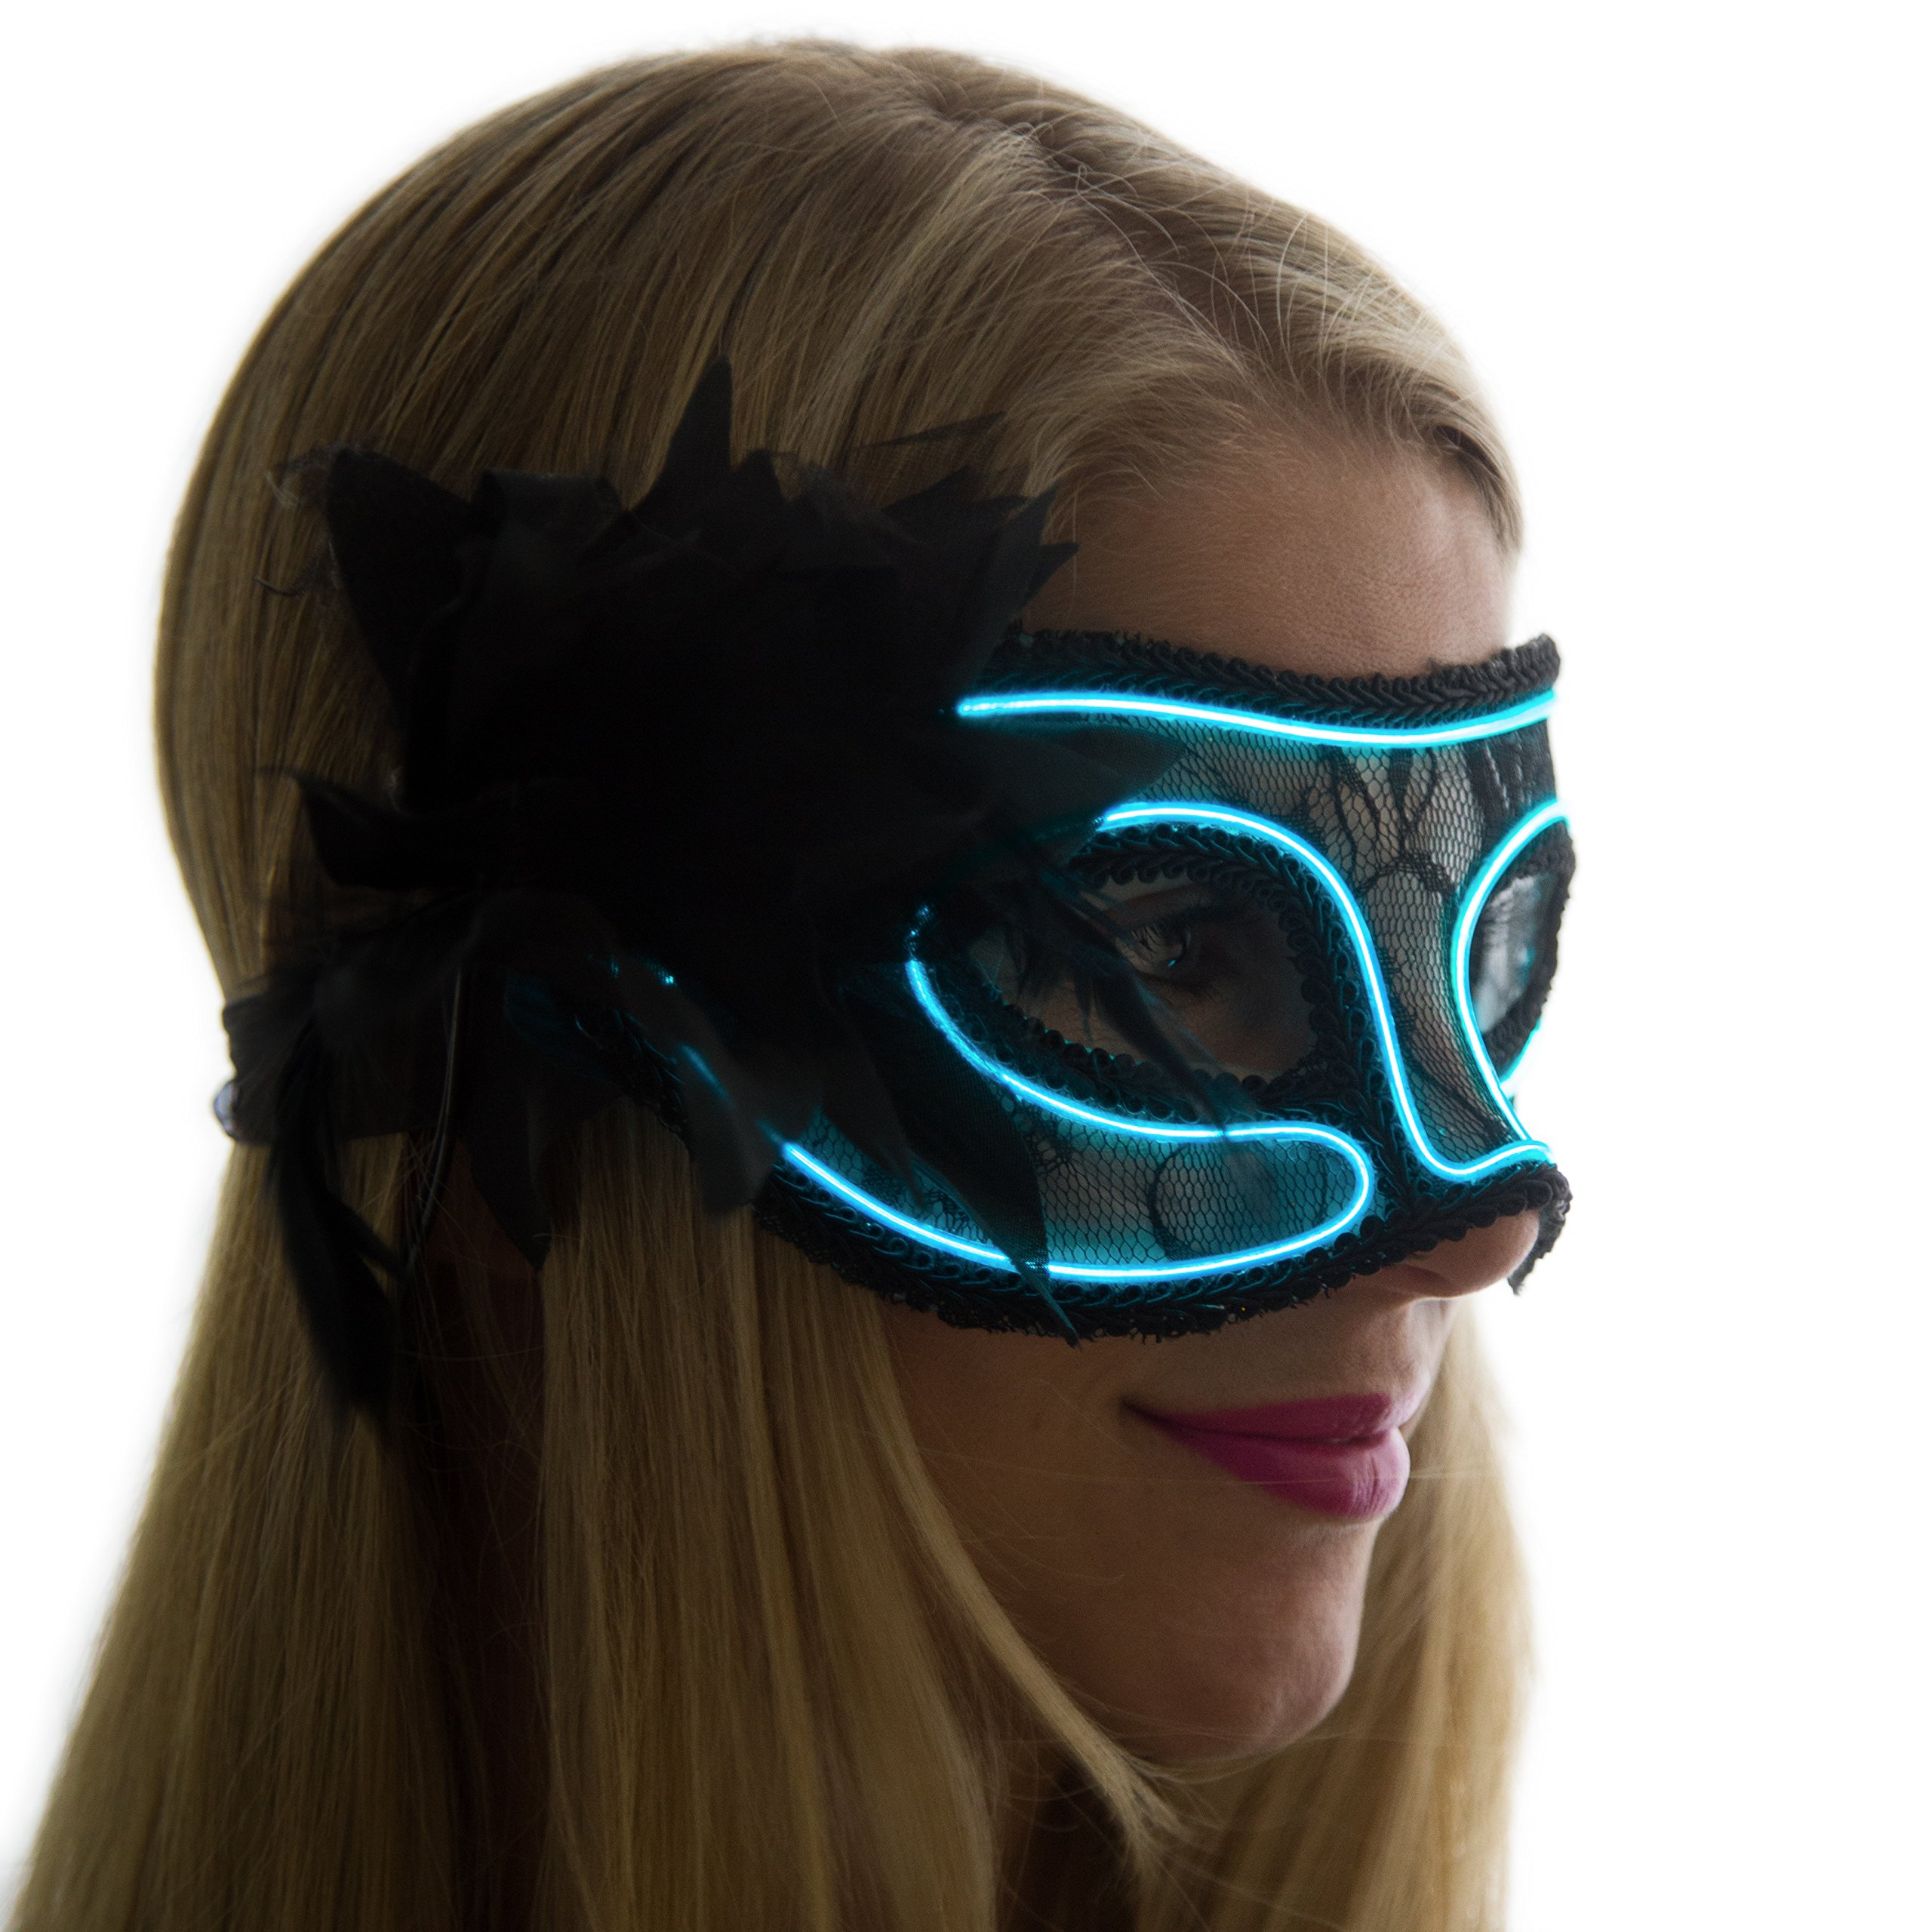 Neon Nightlife Women's Light up Venetian Mask Mardi Gras Masquerade, Aqua